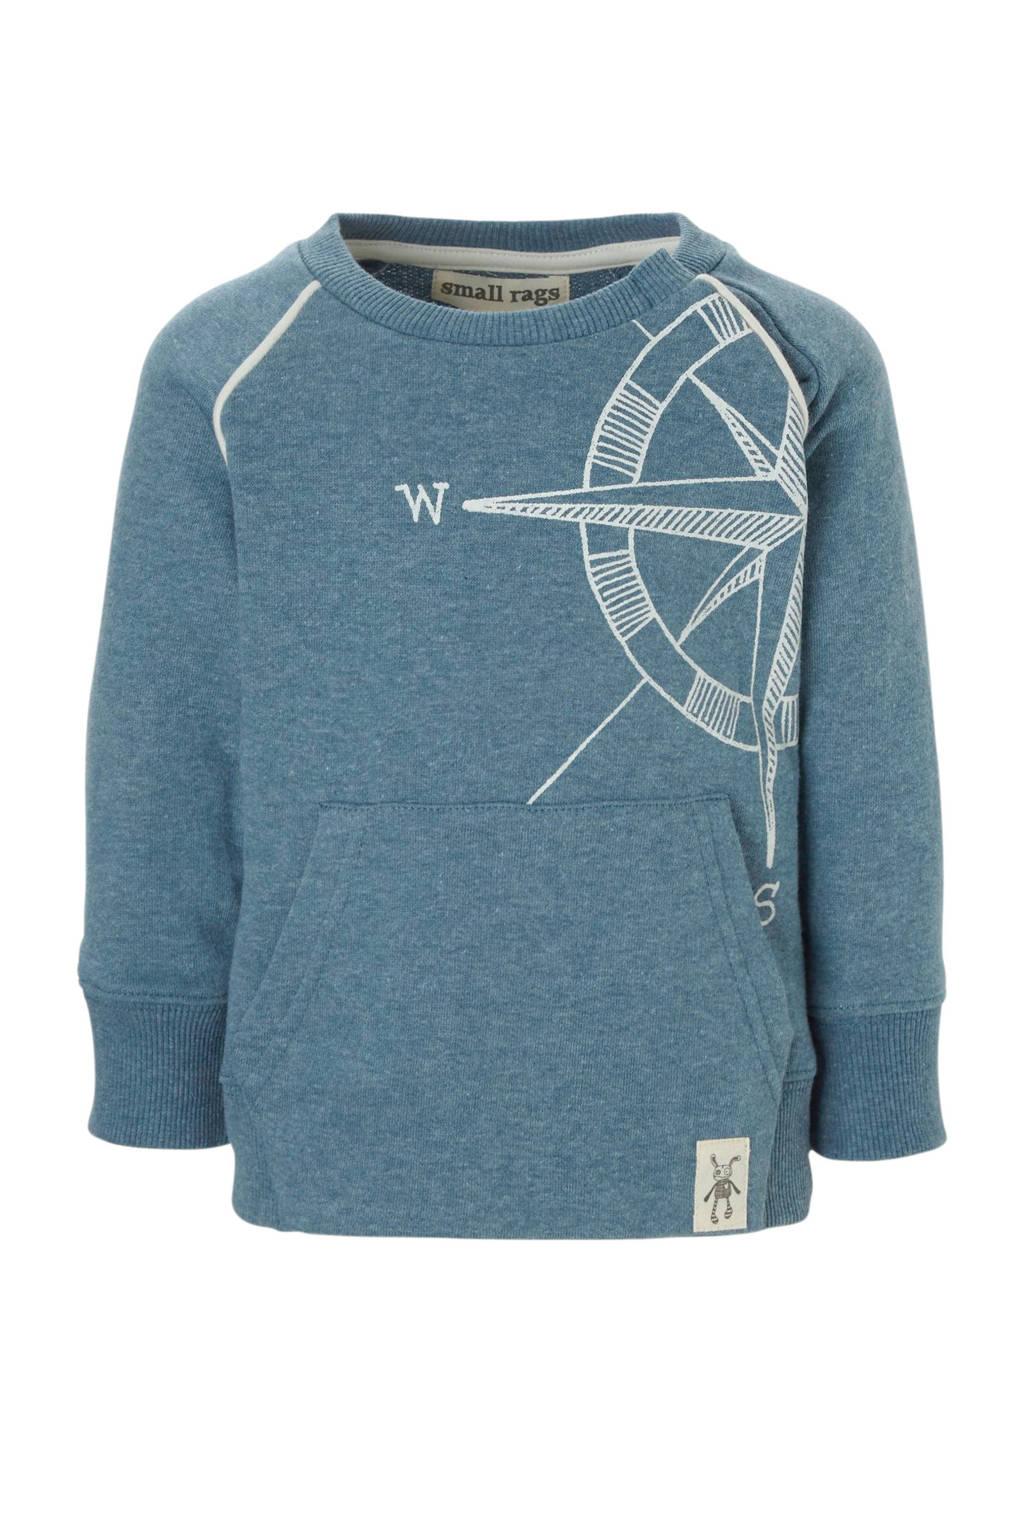 Small Rags sweater, vergrijsd blauw